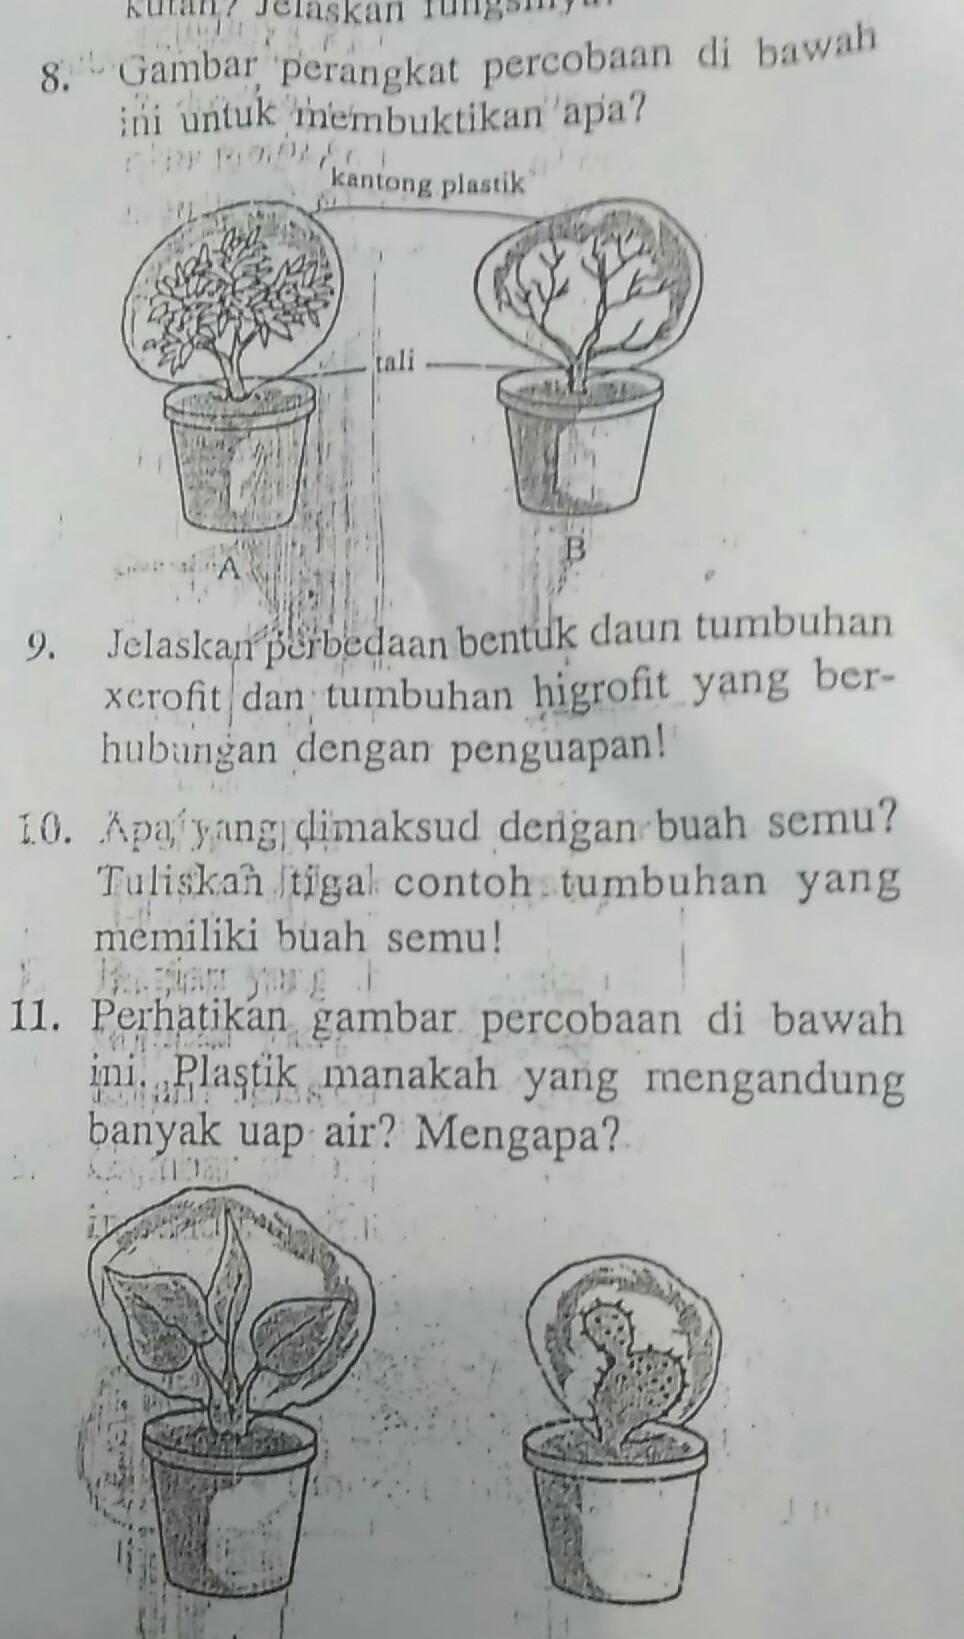 Tumbuhan Hidrofit Beserta Contoh Gambarnya : tumbuhan, hidrofit, beserta, contoh, gambarnya, Contoh, Gambar, Tumbuhan, Higrofit